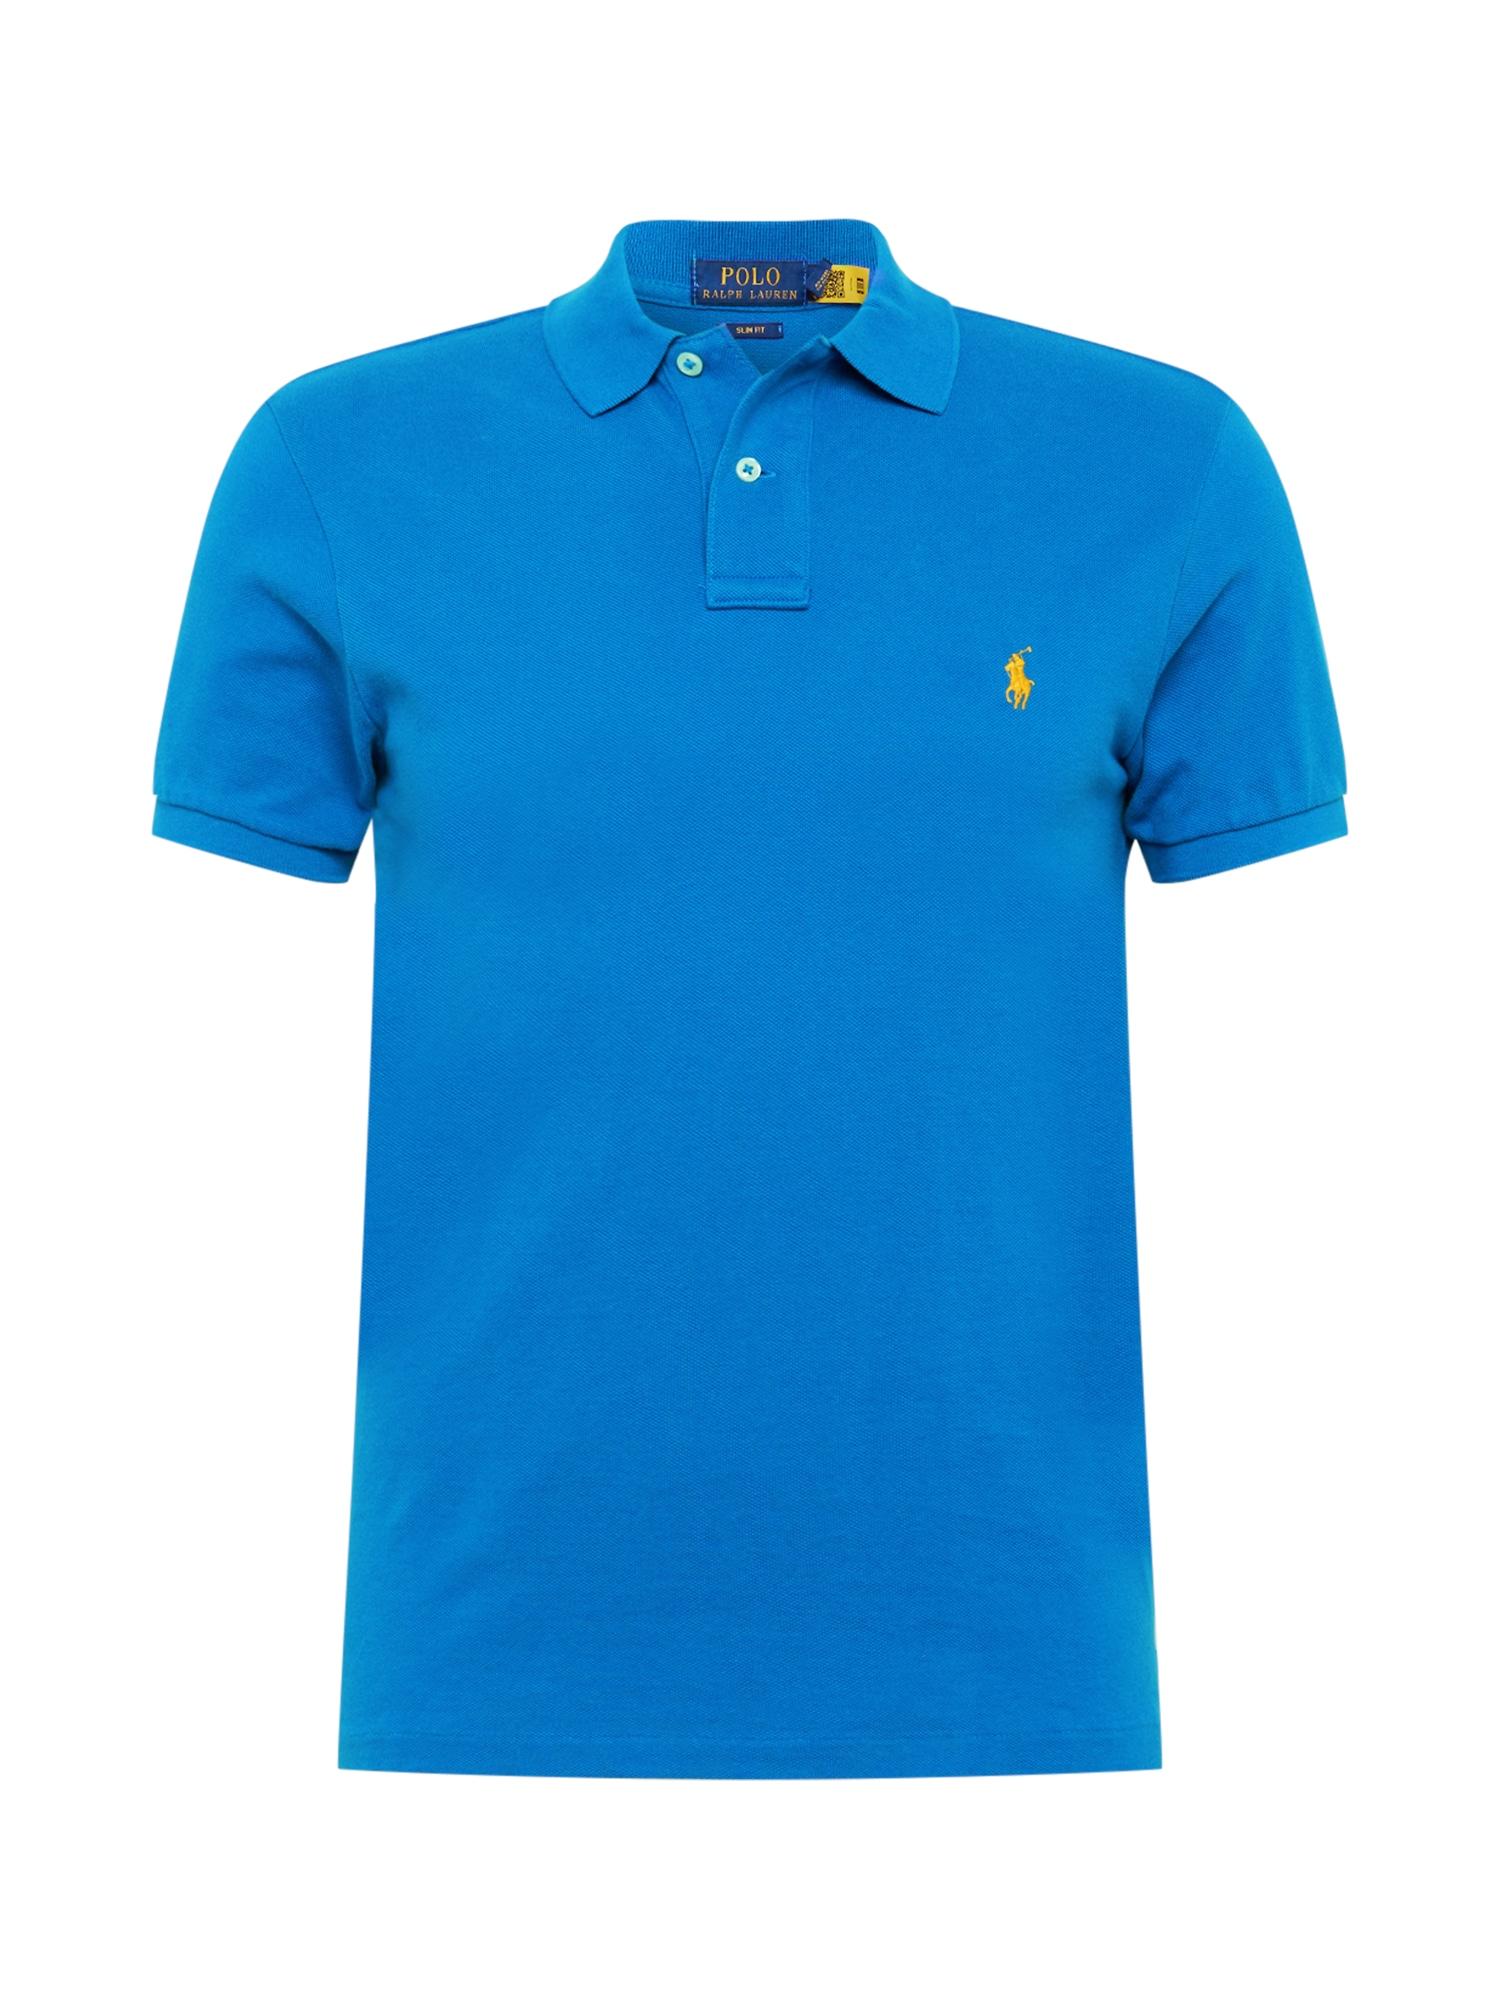 POLO RALPH LAUREN Marškinėliai mėlyna / geltona